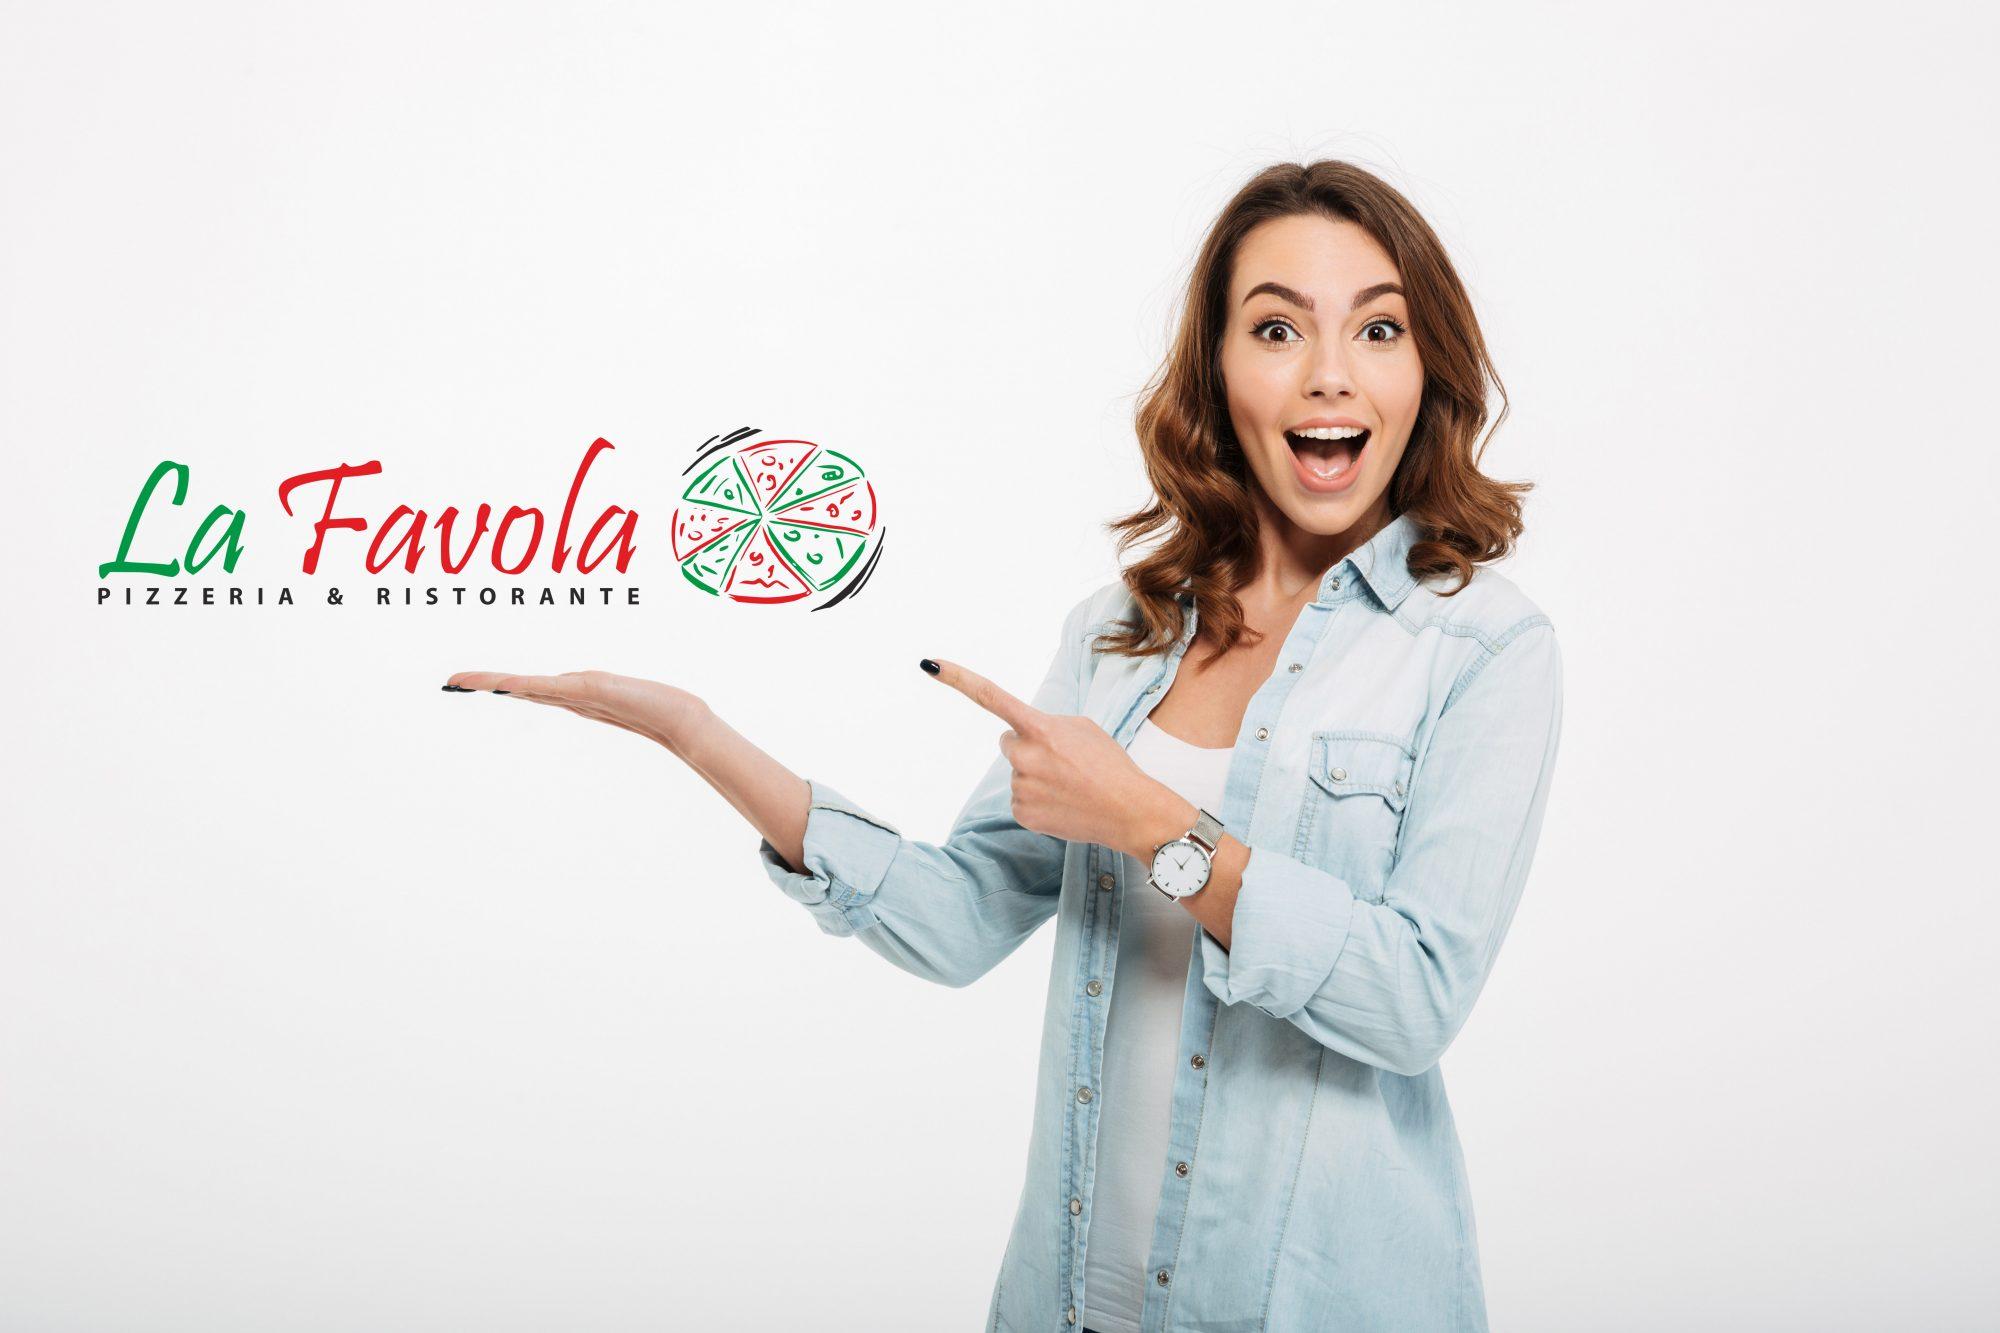 Case study: Pizzeria La Favola